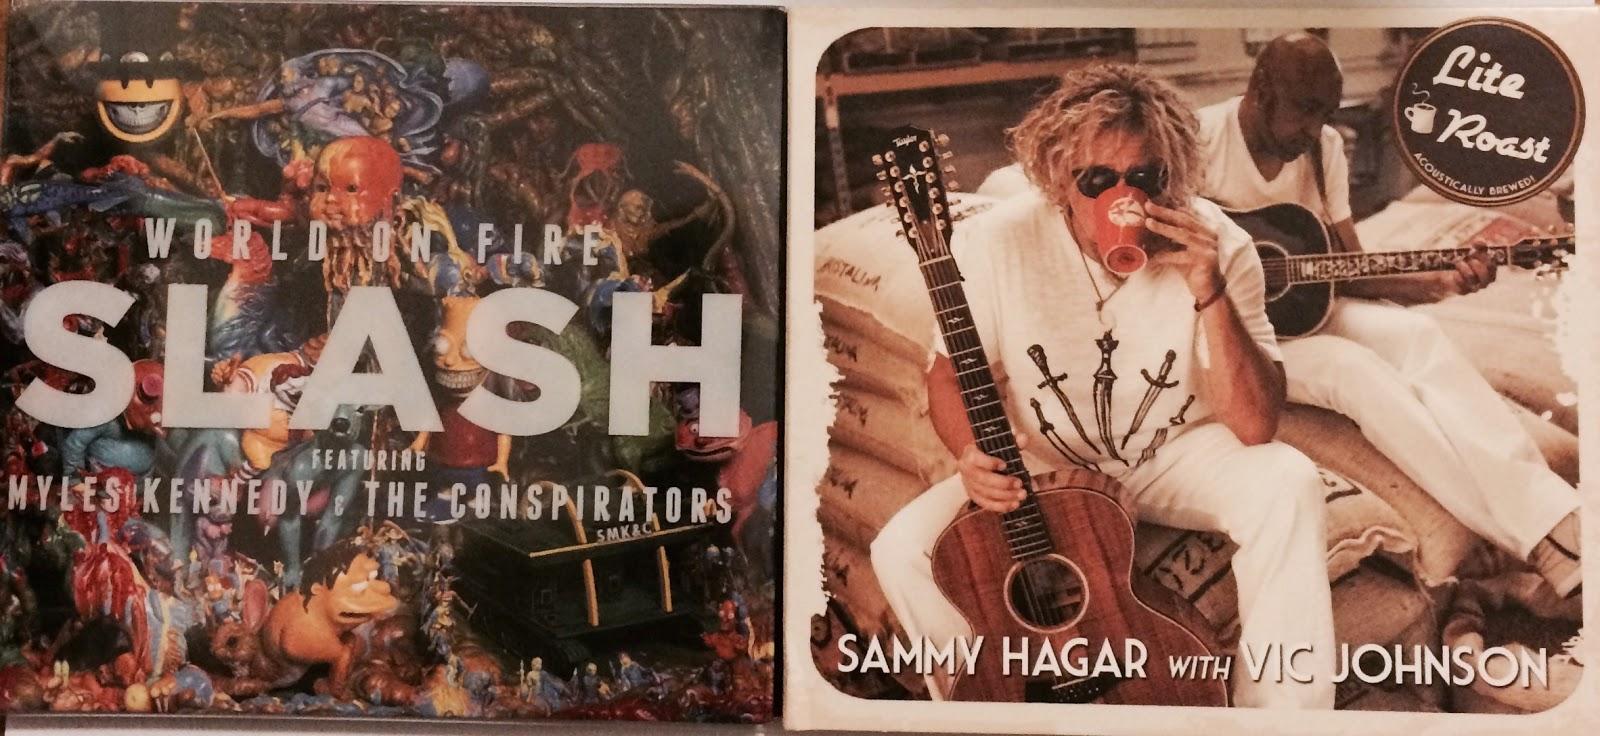 Slash and Sammy Hagar